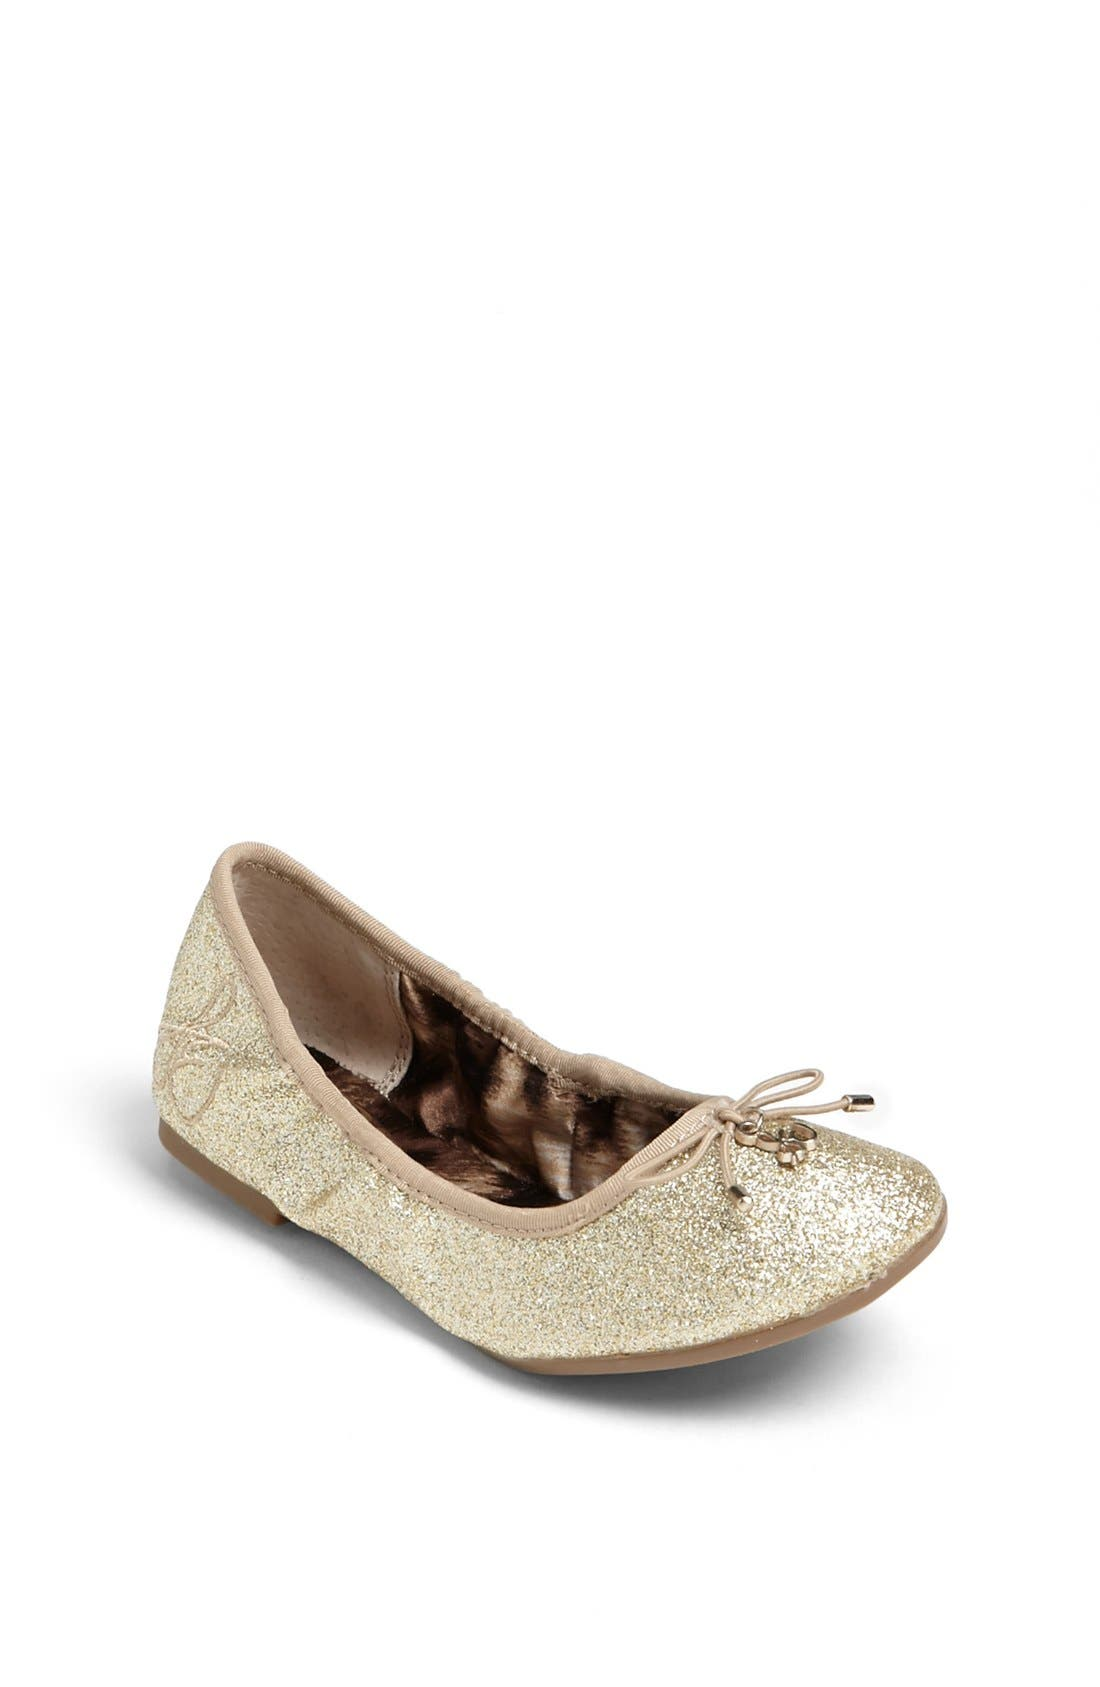 Alternate Image 1 Selected - Sam Edelman 'Fiona' Glitter Ballerina Flat (Toddler, Little Kid & Big Kid)